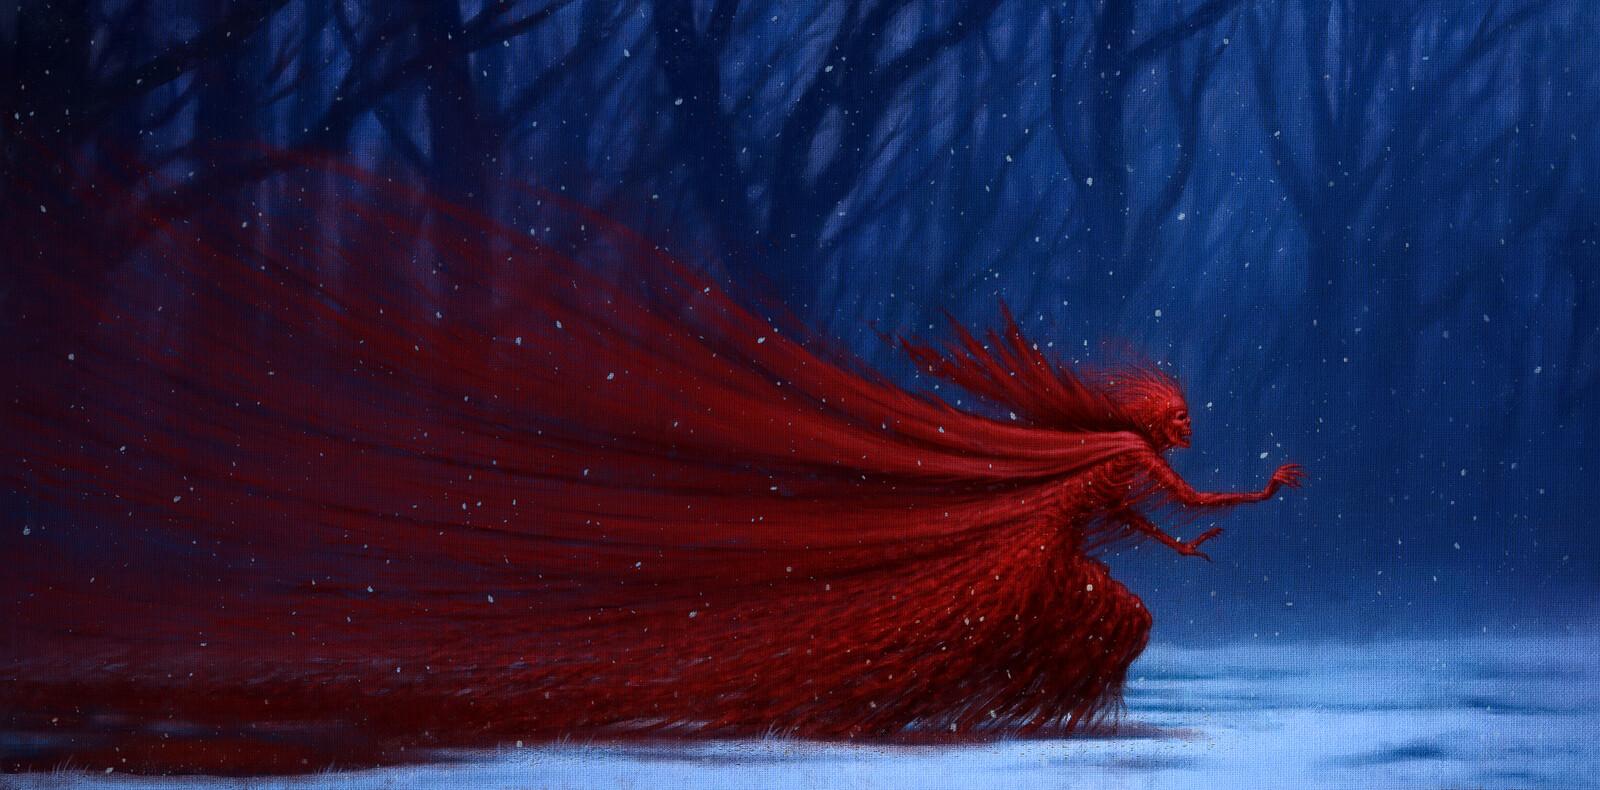 Red Ghast